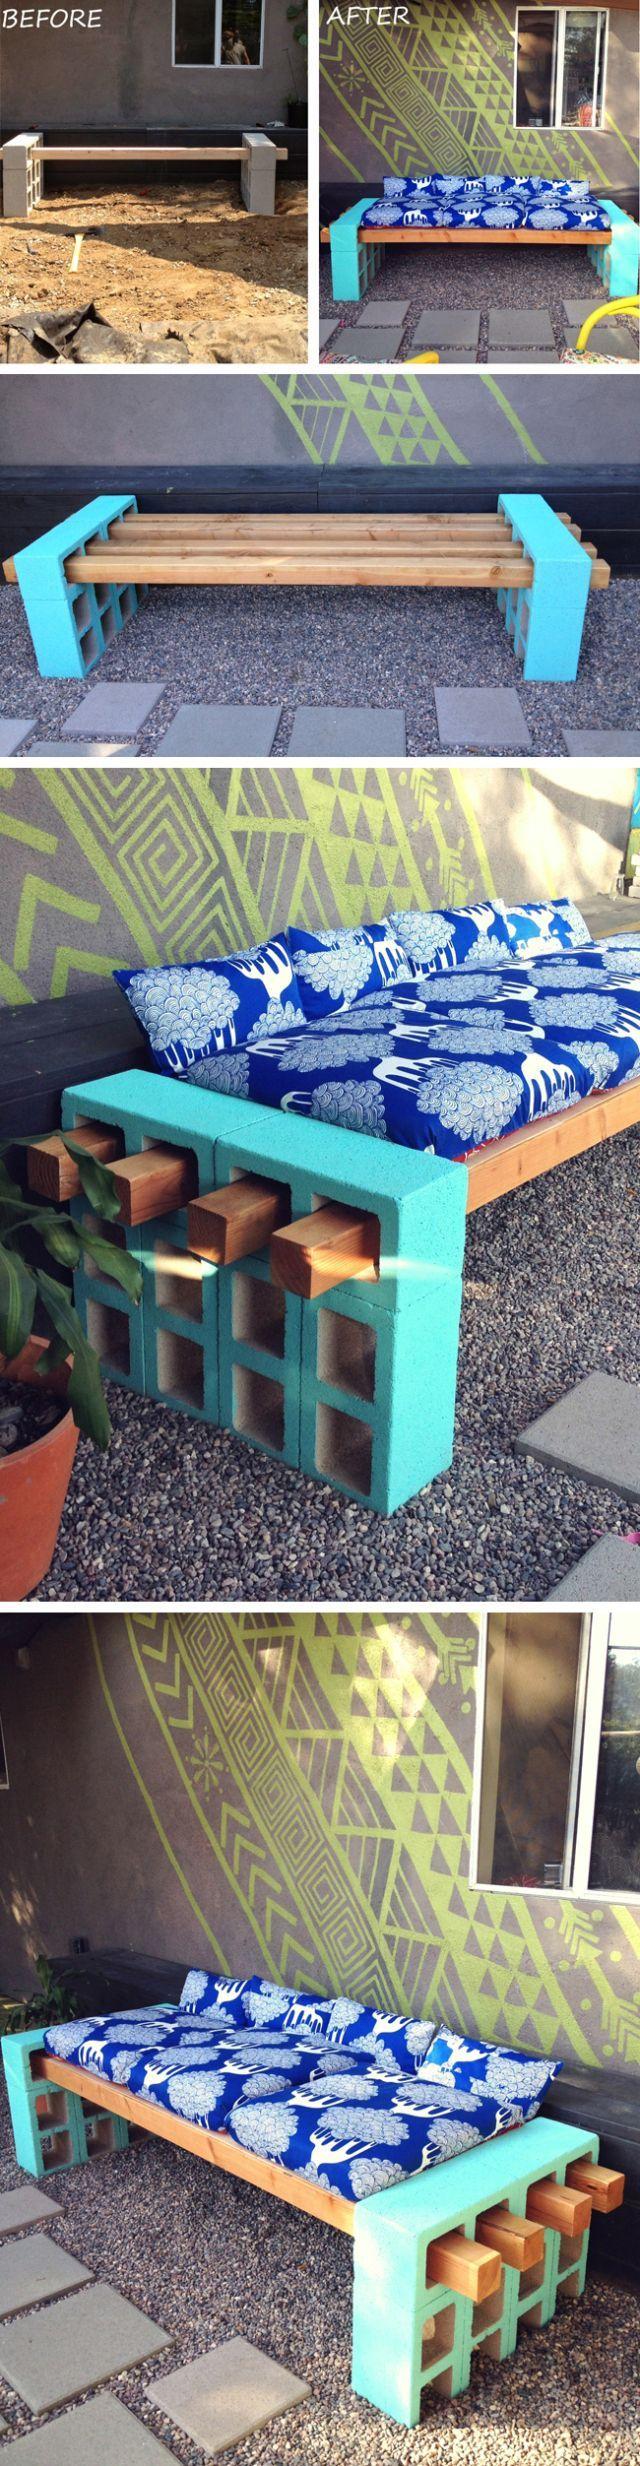 DIY concrete block bench seating | furniture design | awesome DIY inspiration #product_design